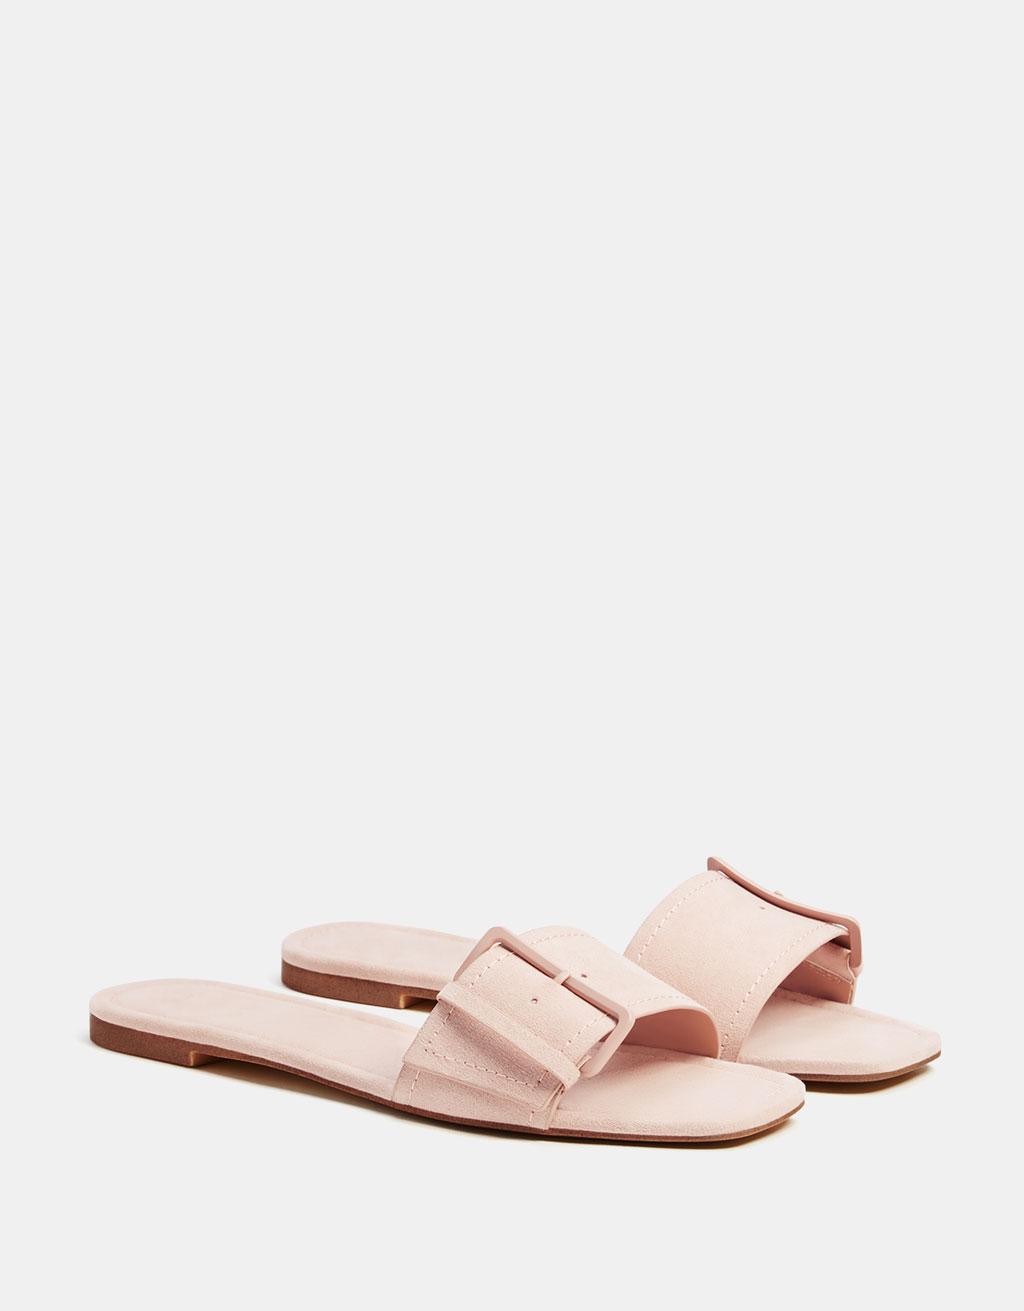 Sandalo basso con fibbie